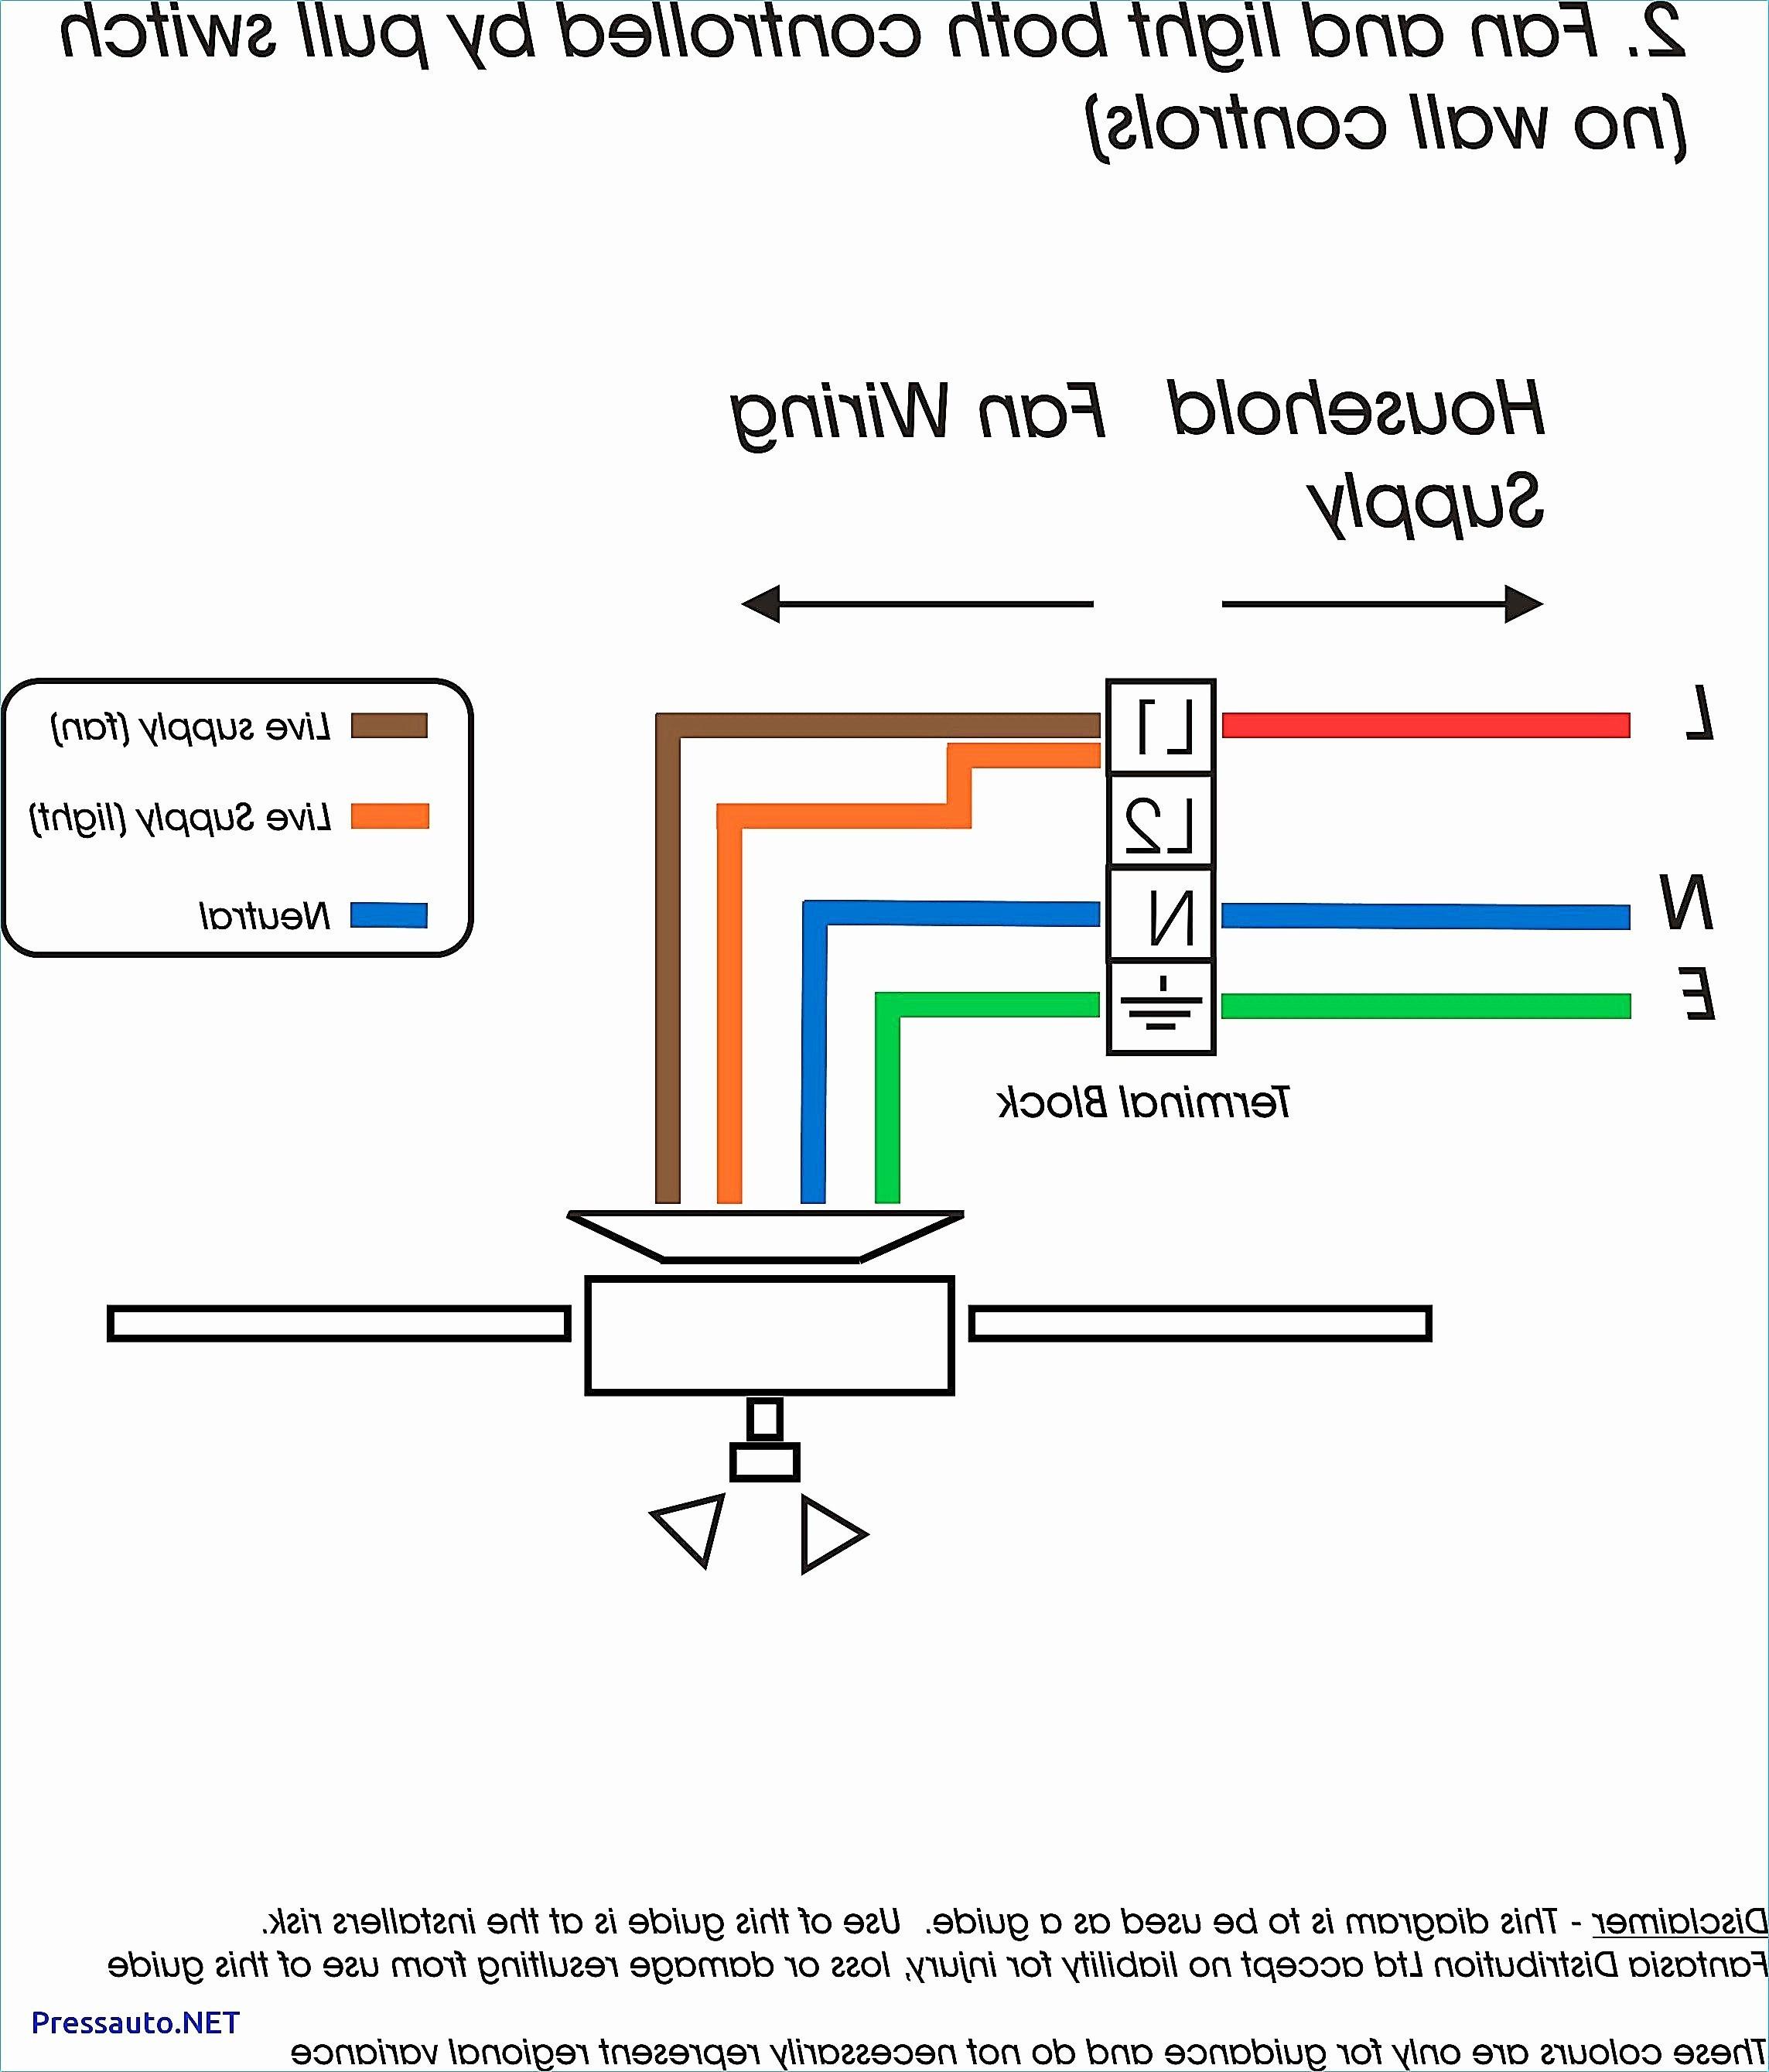 Car Audio Connection Diagram Wiring Diagram Car Audio Amplifier Valid Car Audio Wiring Diagrams Of Car Audio Connection Diagram